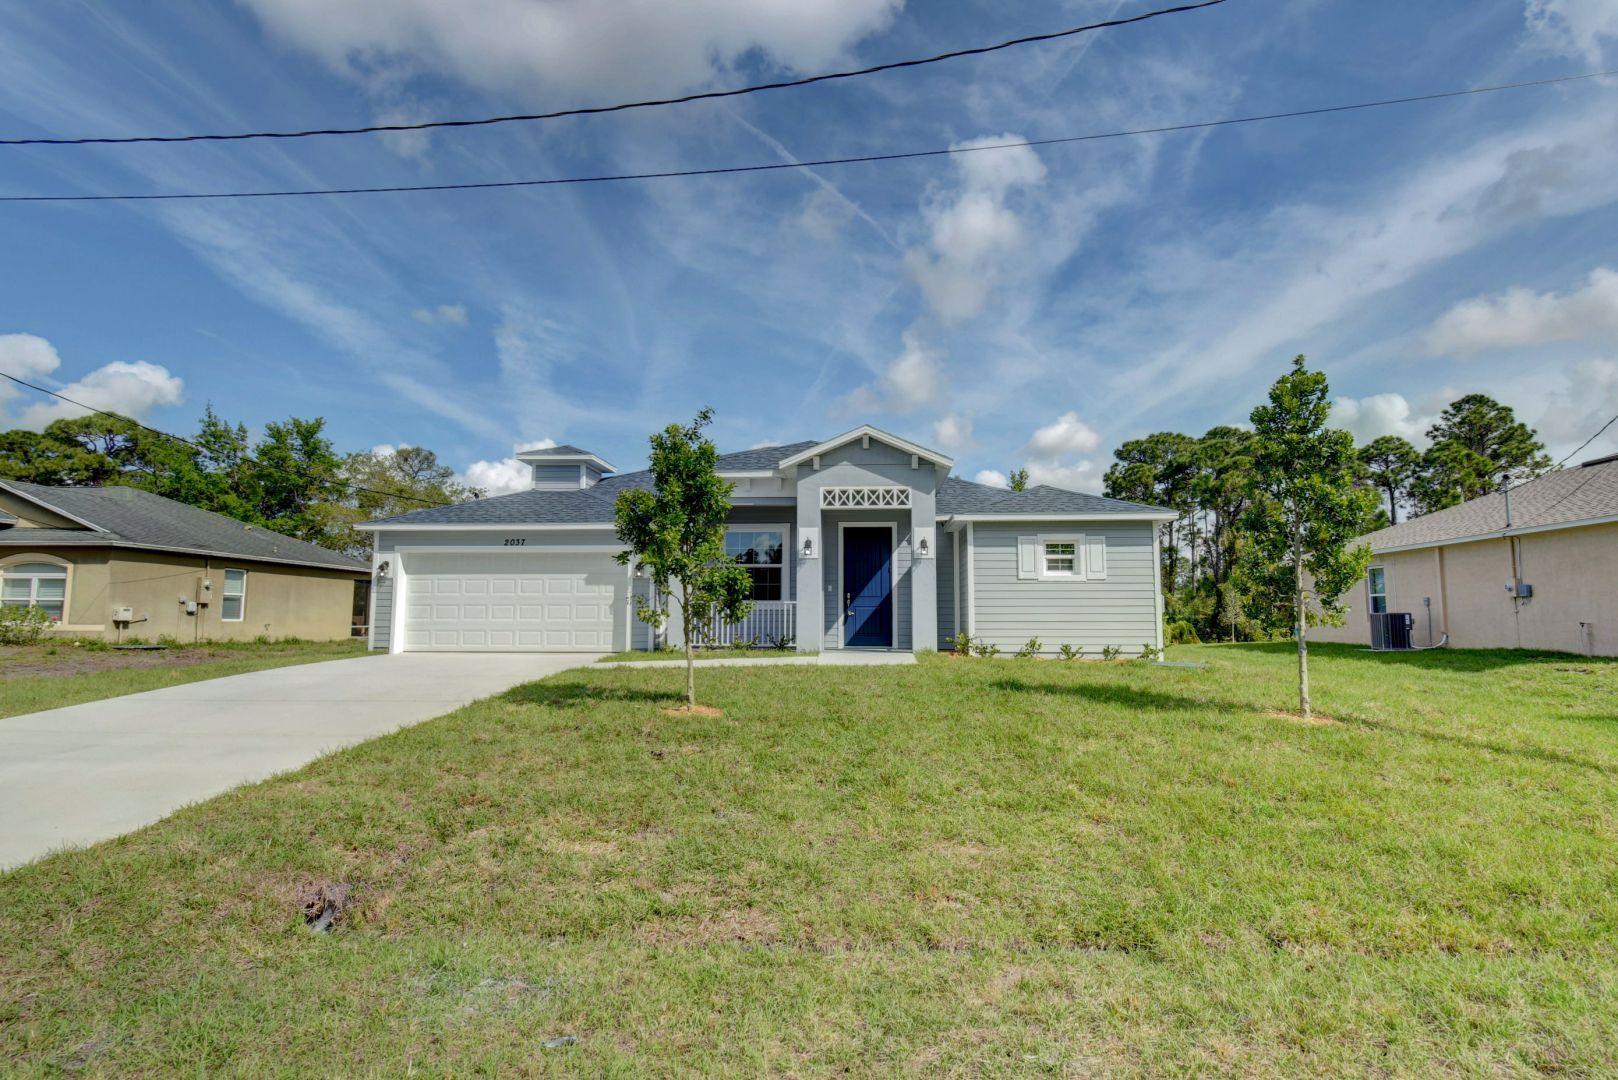 Photo of 5842 NW Windy Pines Lane, Port Saint Lucie, FL 34986